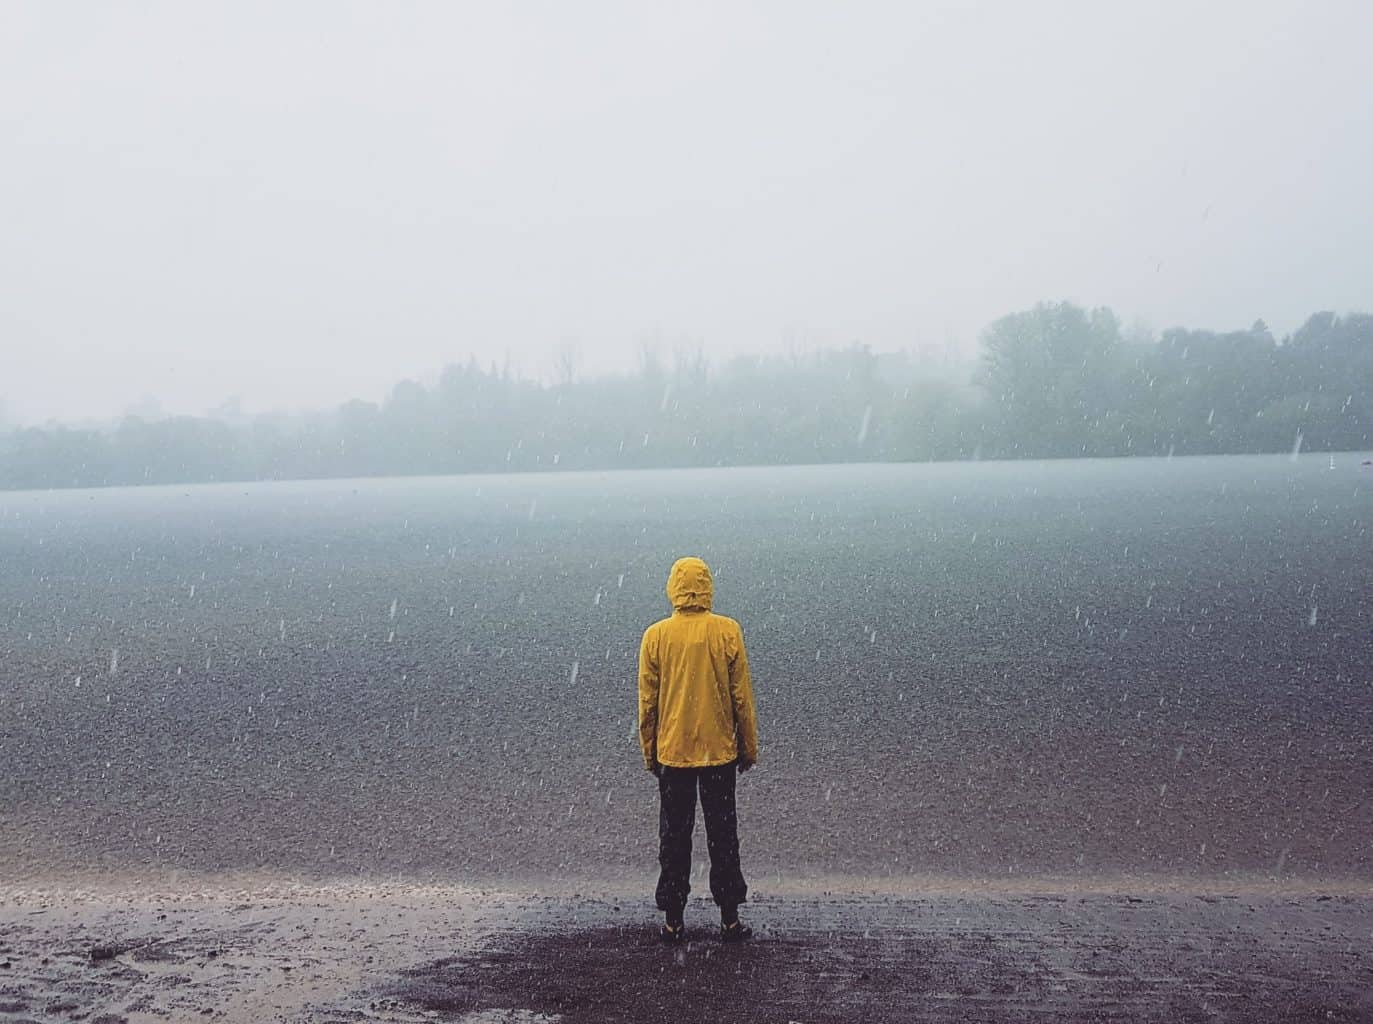 man wearing yellow rain jacket in the rain